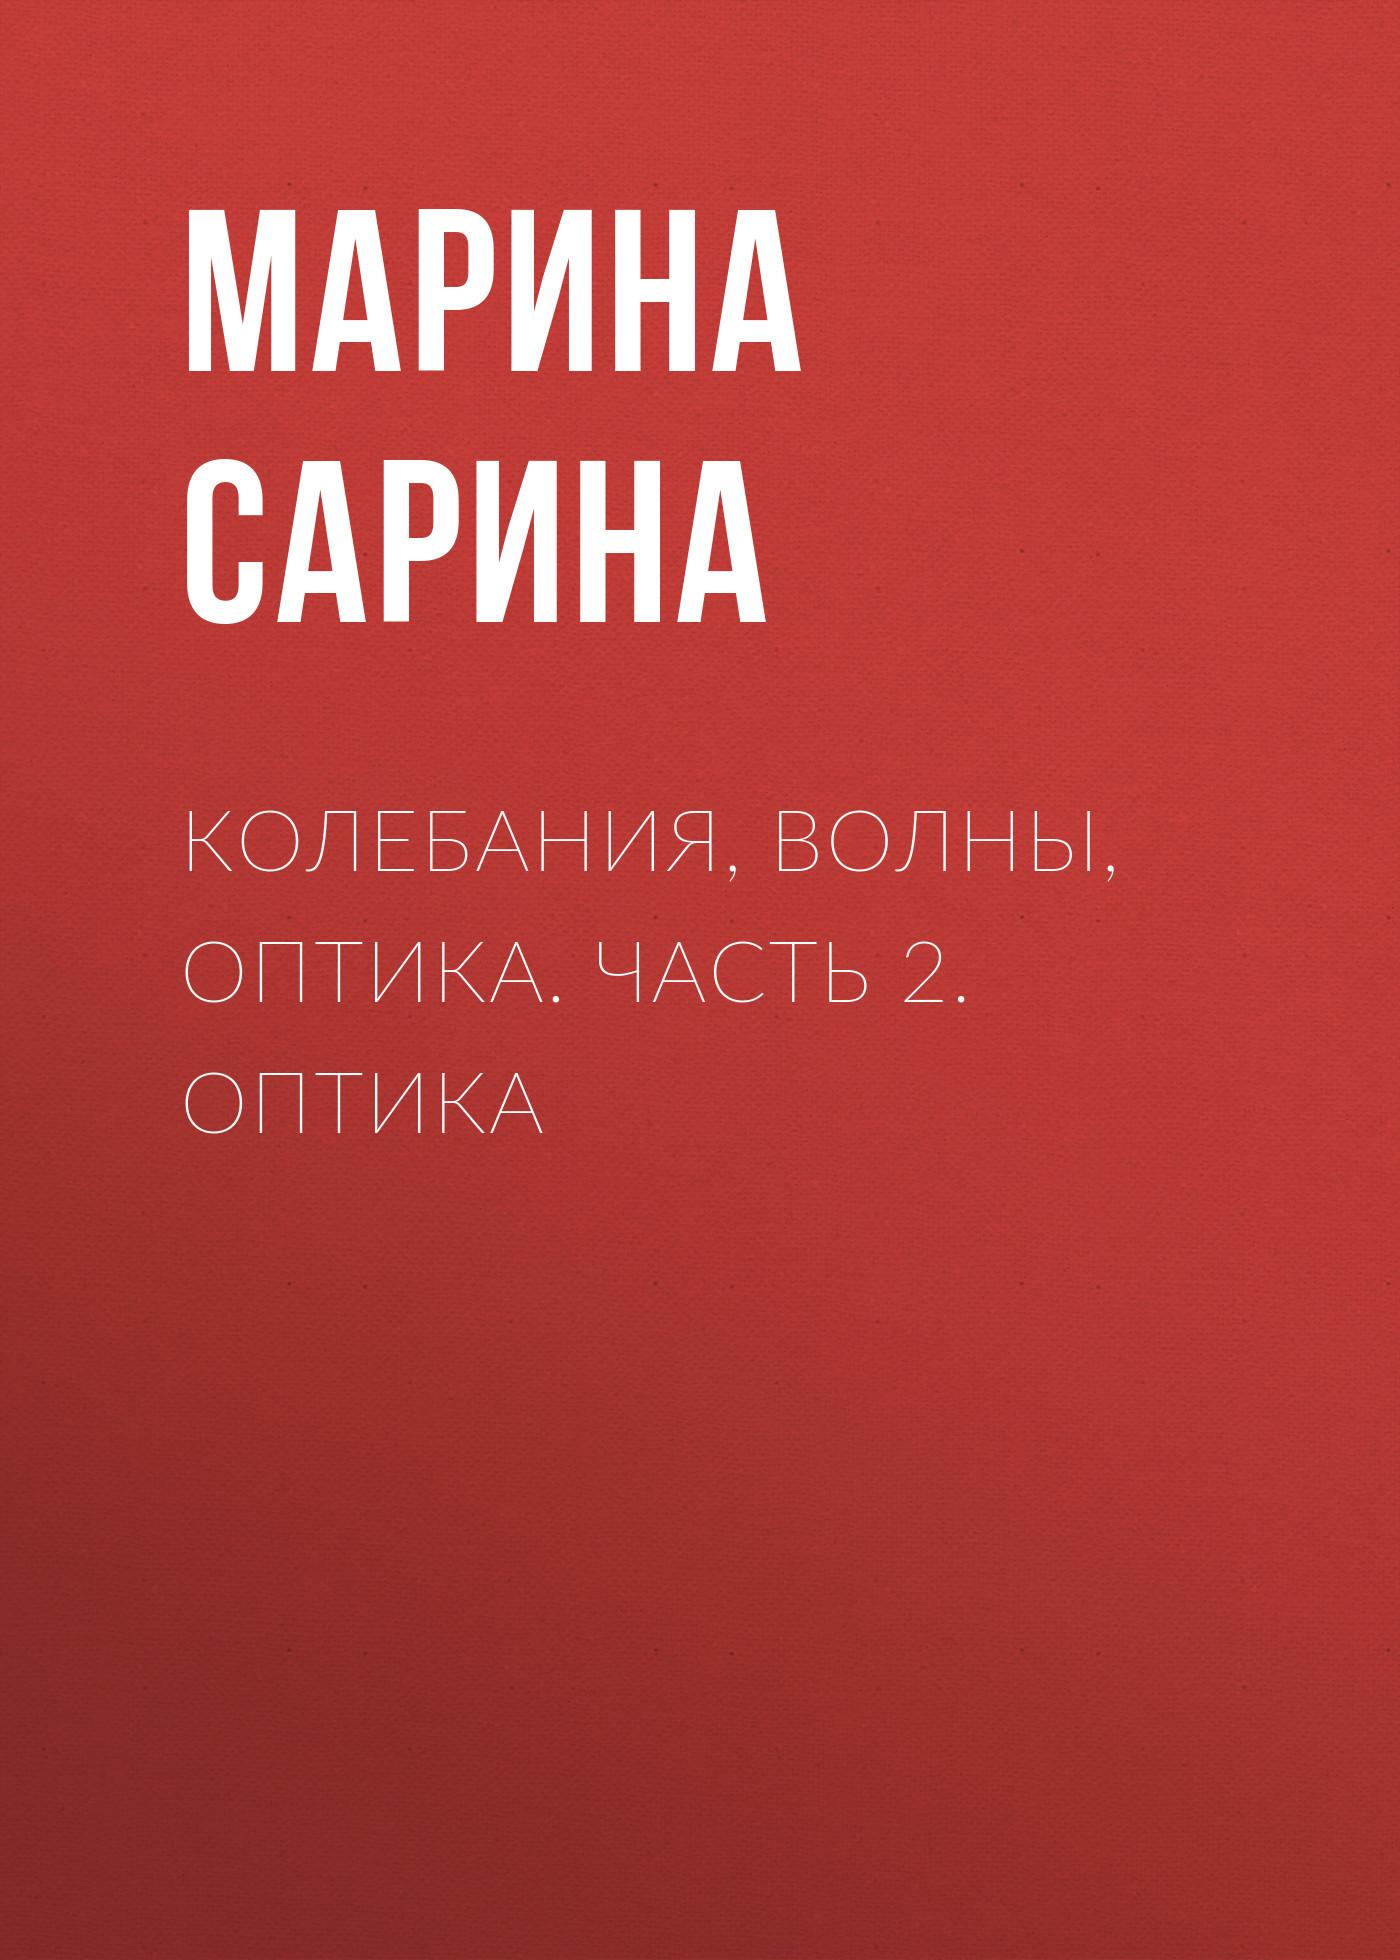 Марина Сарина Колебания, волны, оптика. Часть 2. Оптика ISBN: 978-5-7782-2697-5 оптика днепр